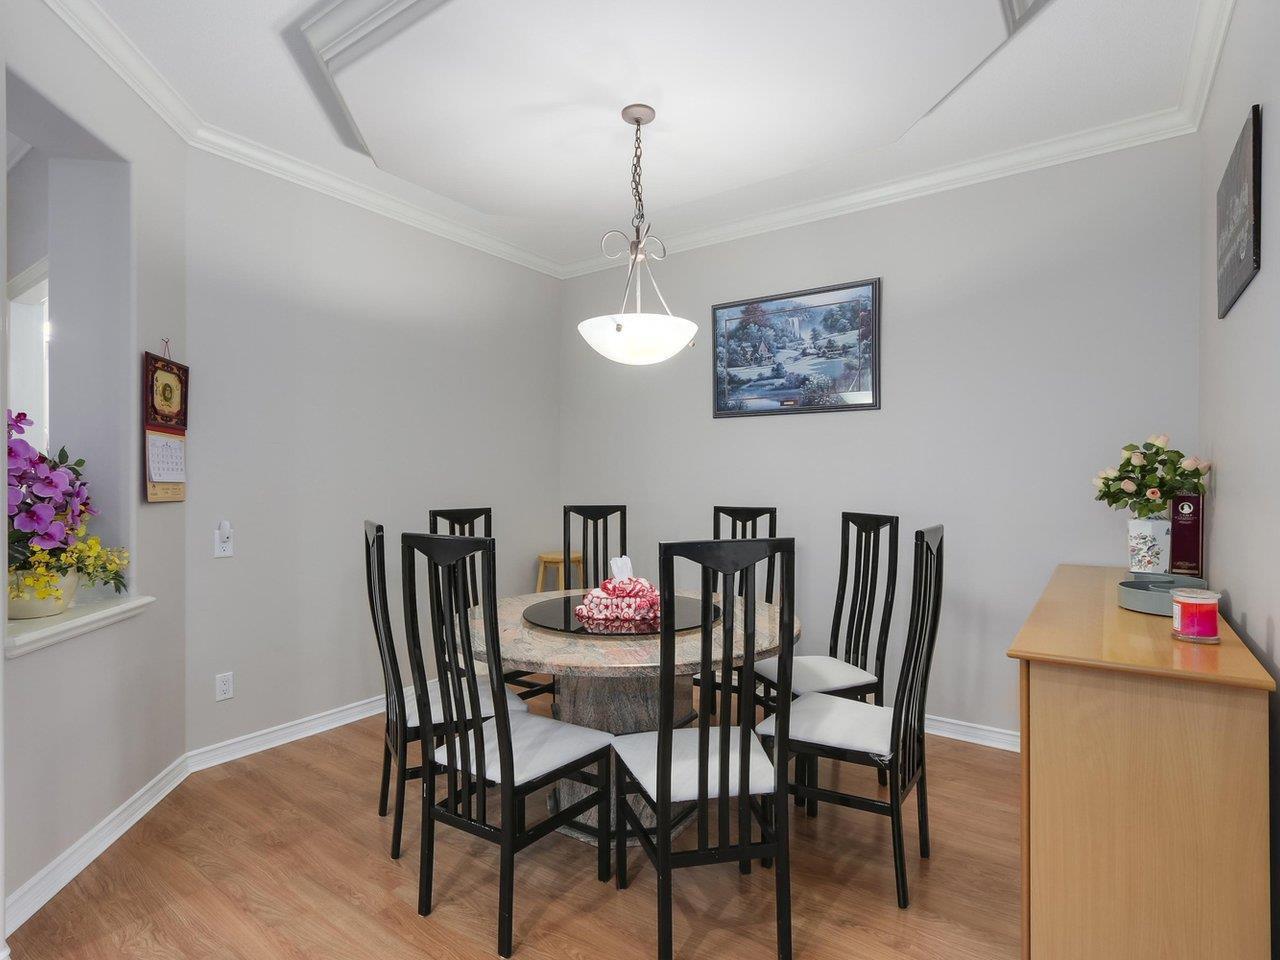 Photo 6: Photos: 303 3280 PLATEAU BOULEVARD in Coquitlam: Westwood Plateau Condo for sale : MLS®# R2275918